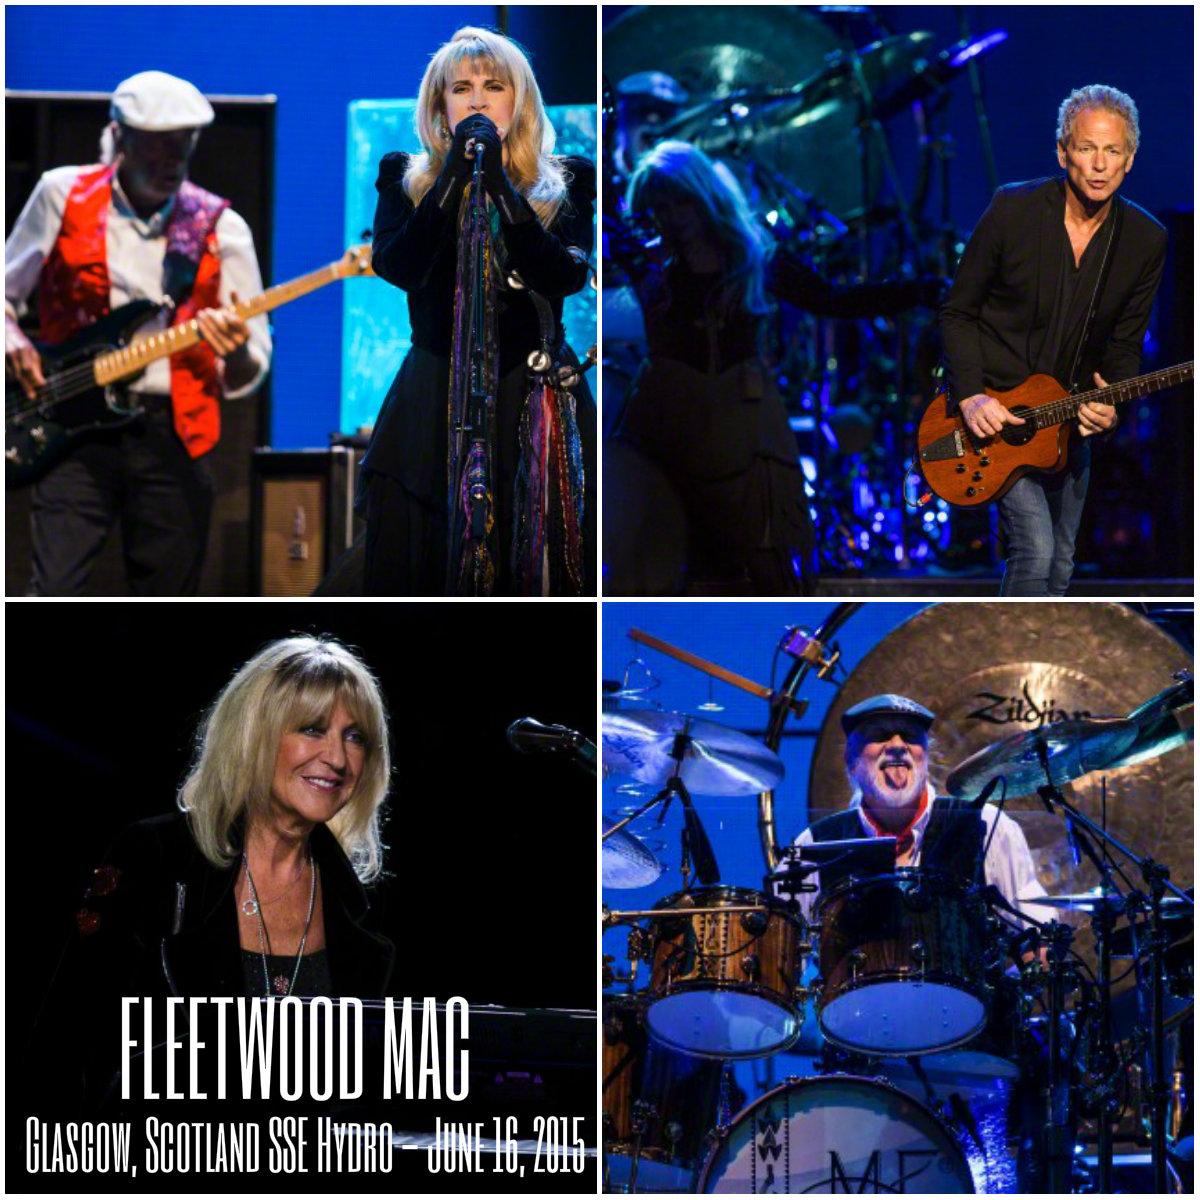 fleetwood mac concert review glasgow